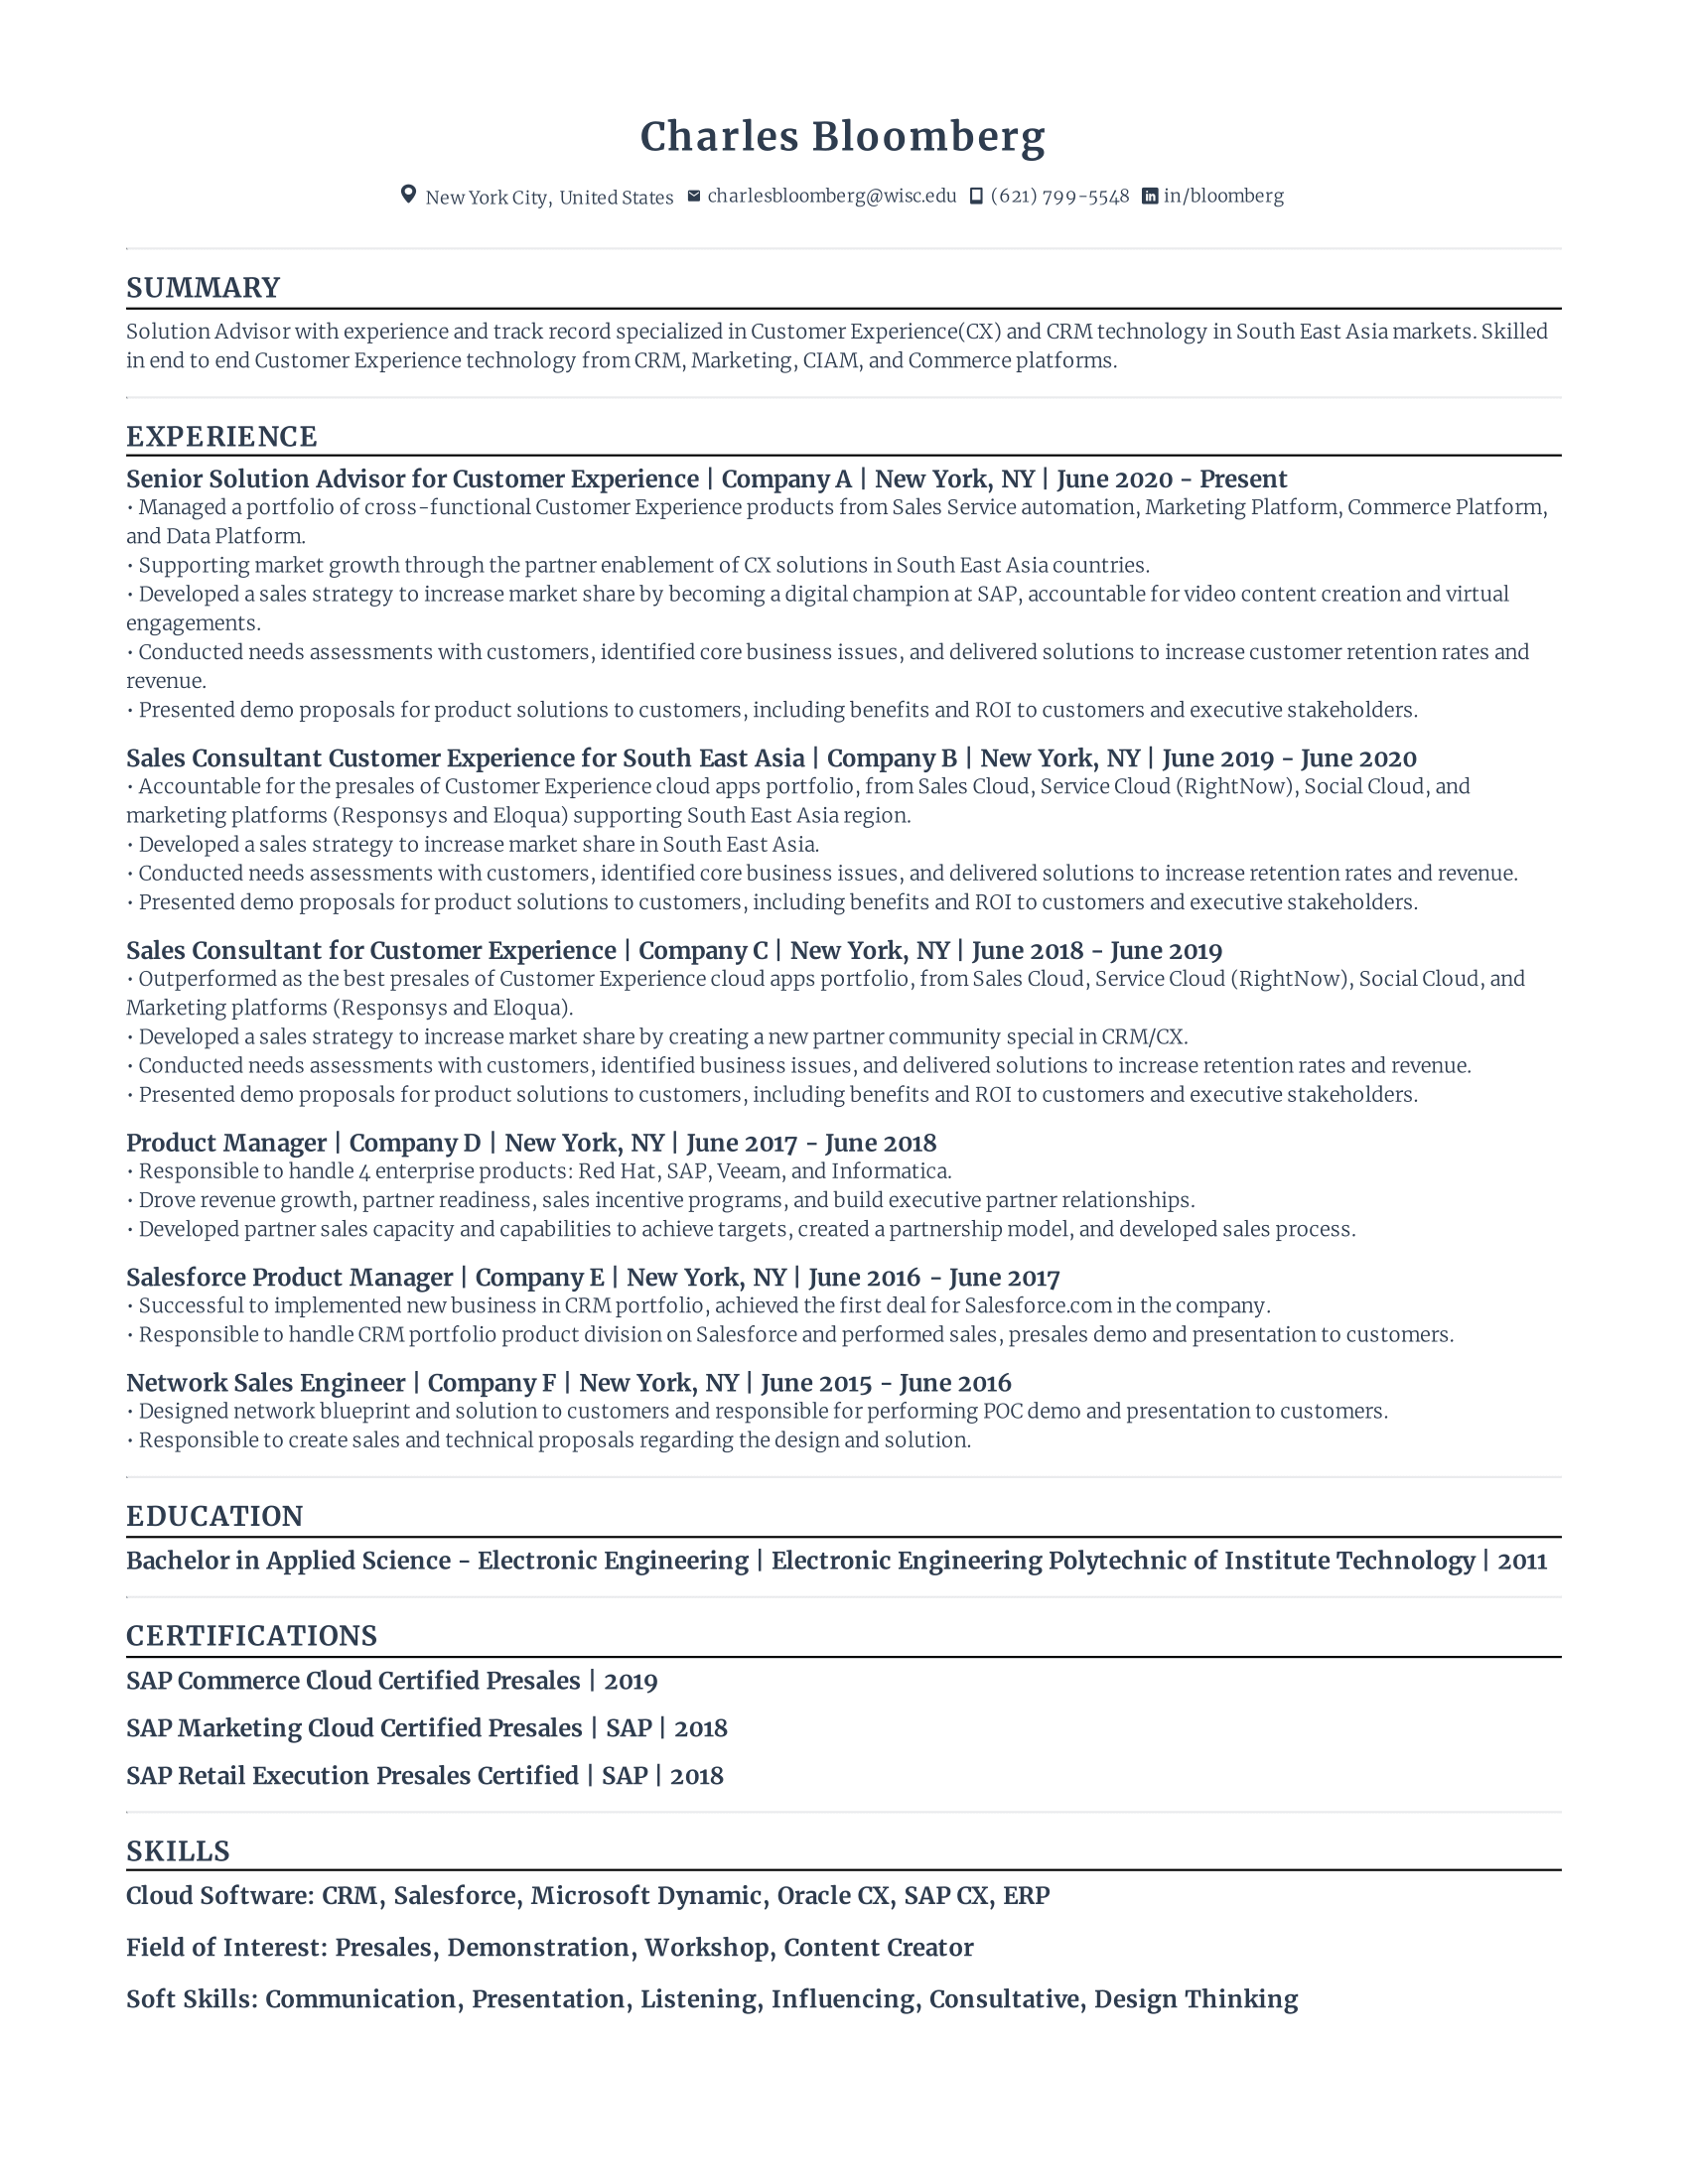 SAP Developer 2